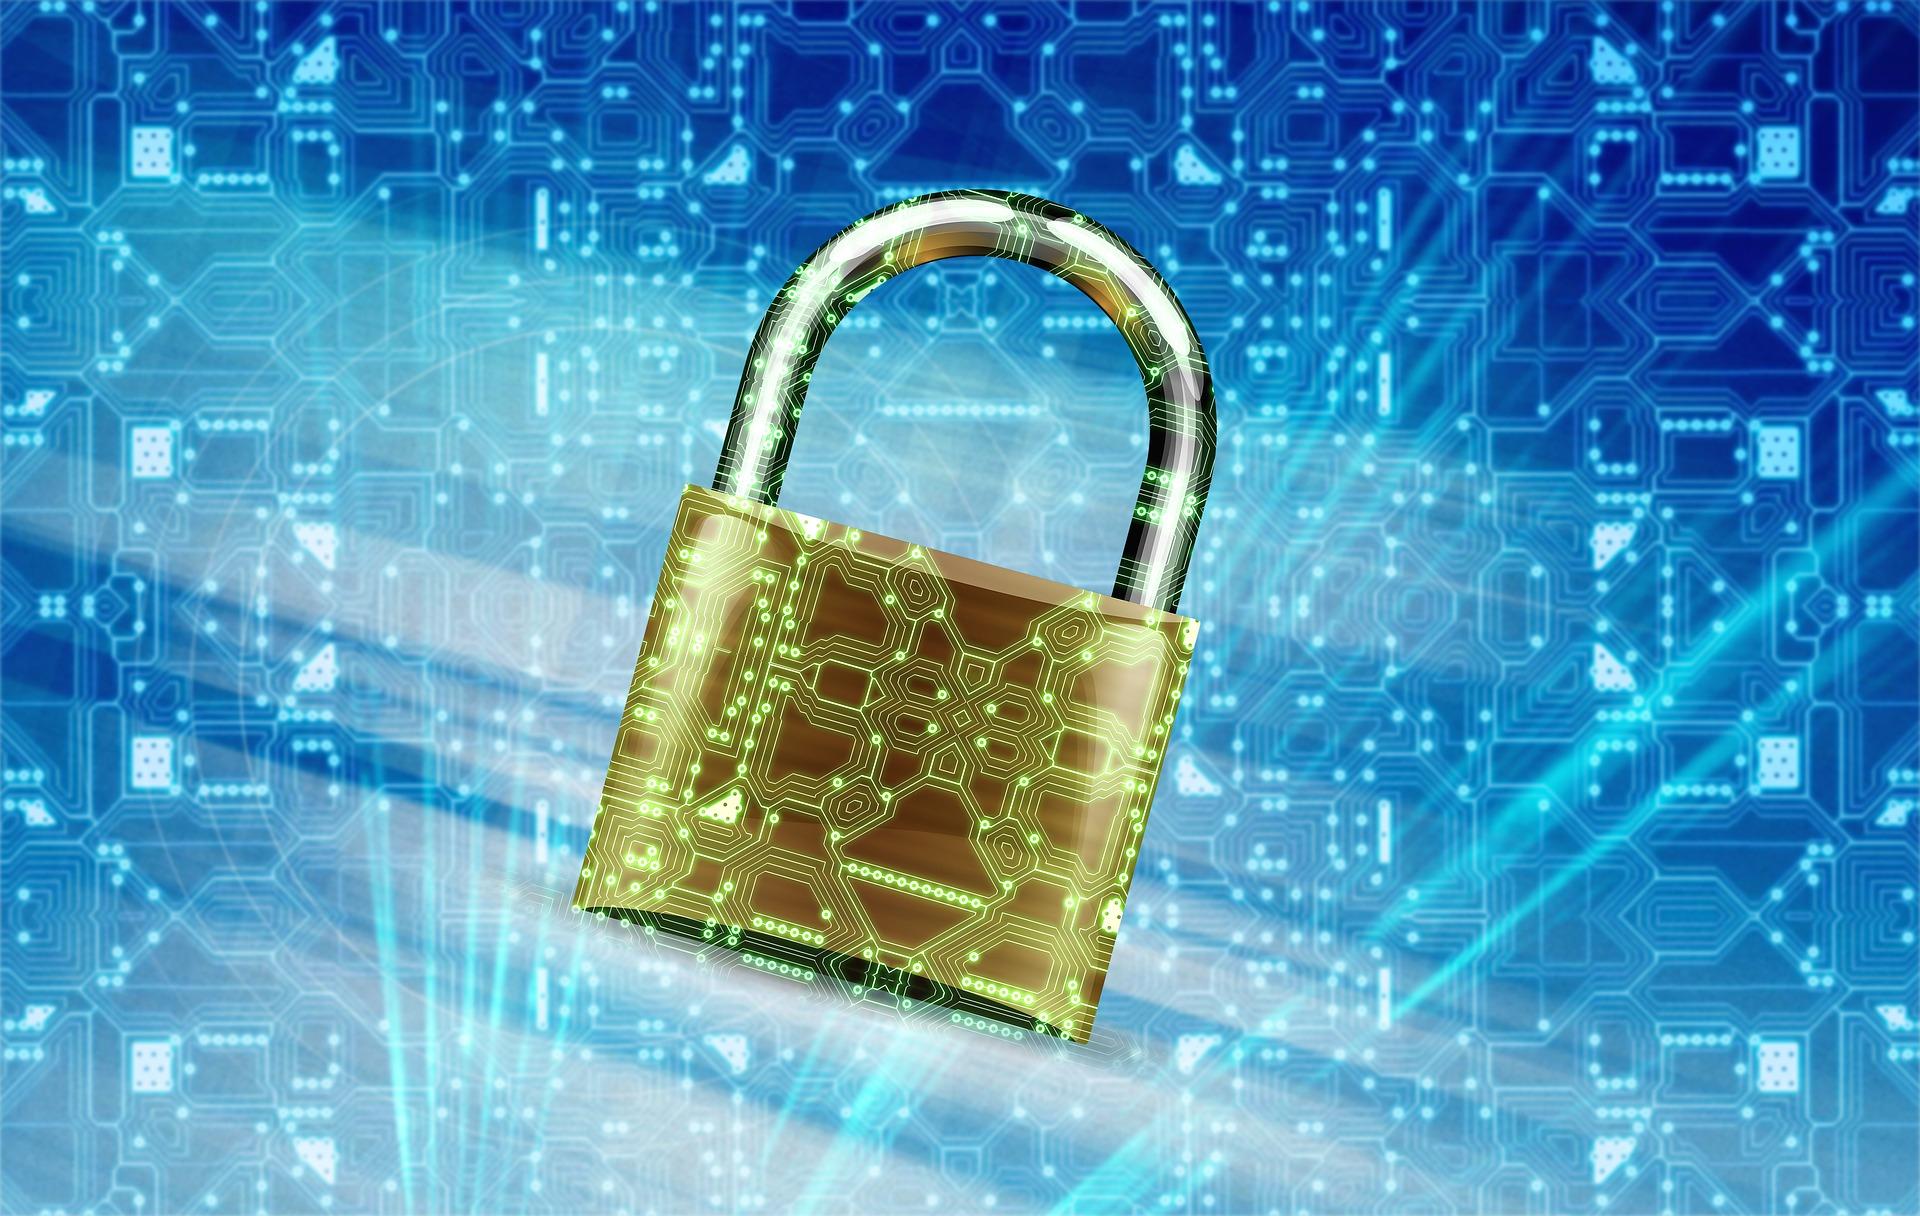 Security 2168233 1920 2